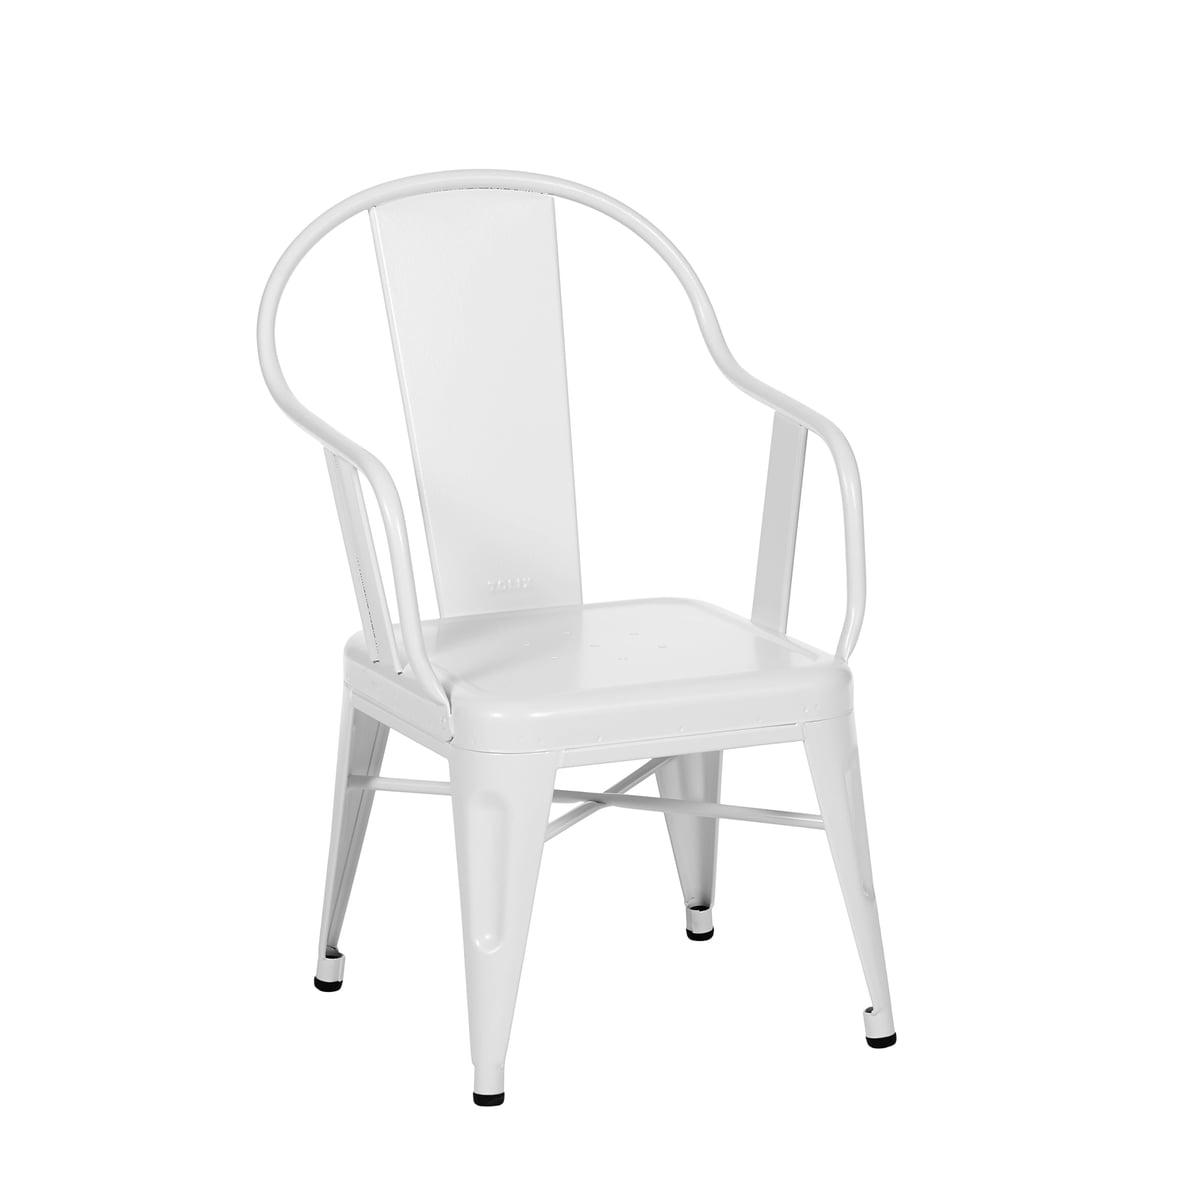 Tolix - Möwe Kinderstuhl, weiß matt | Kinderzimmer > Kinderzimmerstühle > Kinderstühle | Weiß matt | Tolix